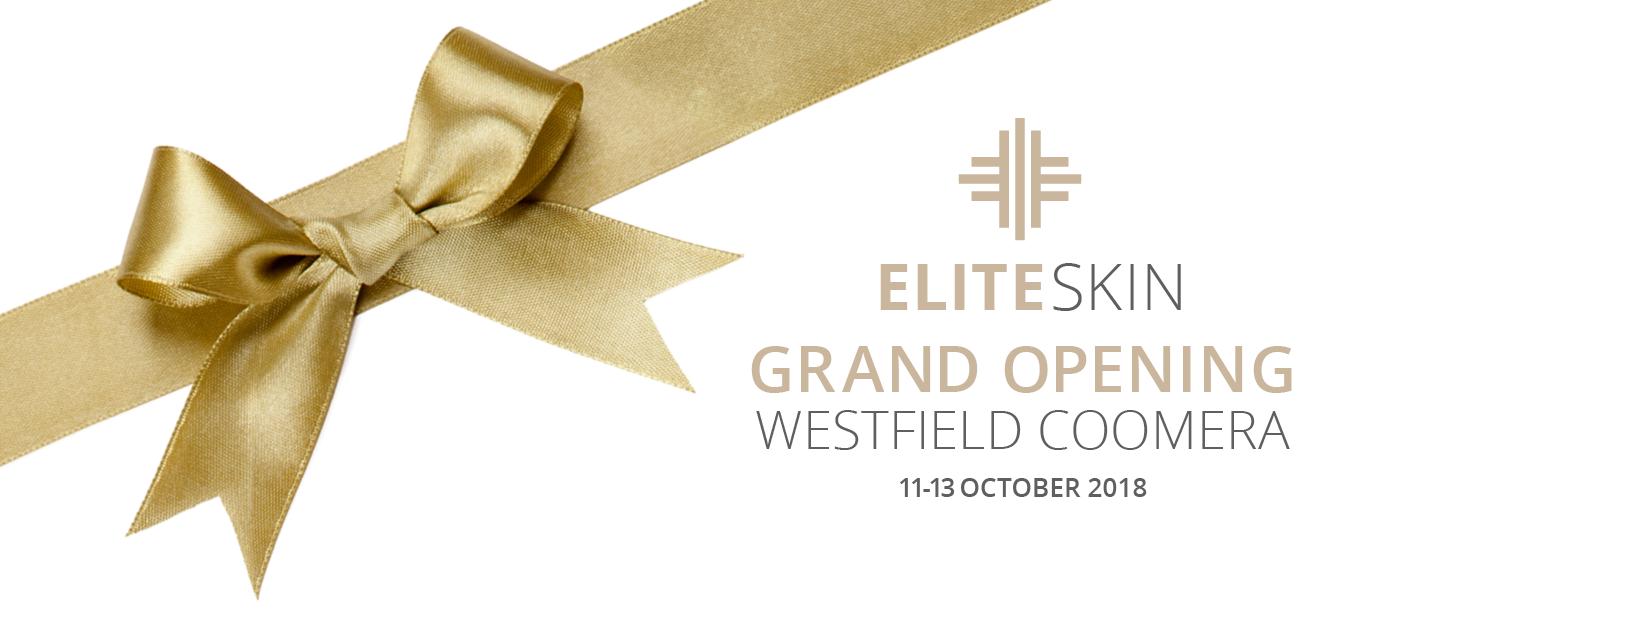 Elite-Skin-Grand-Opening-FB-Banner